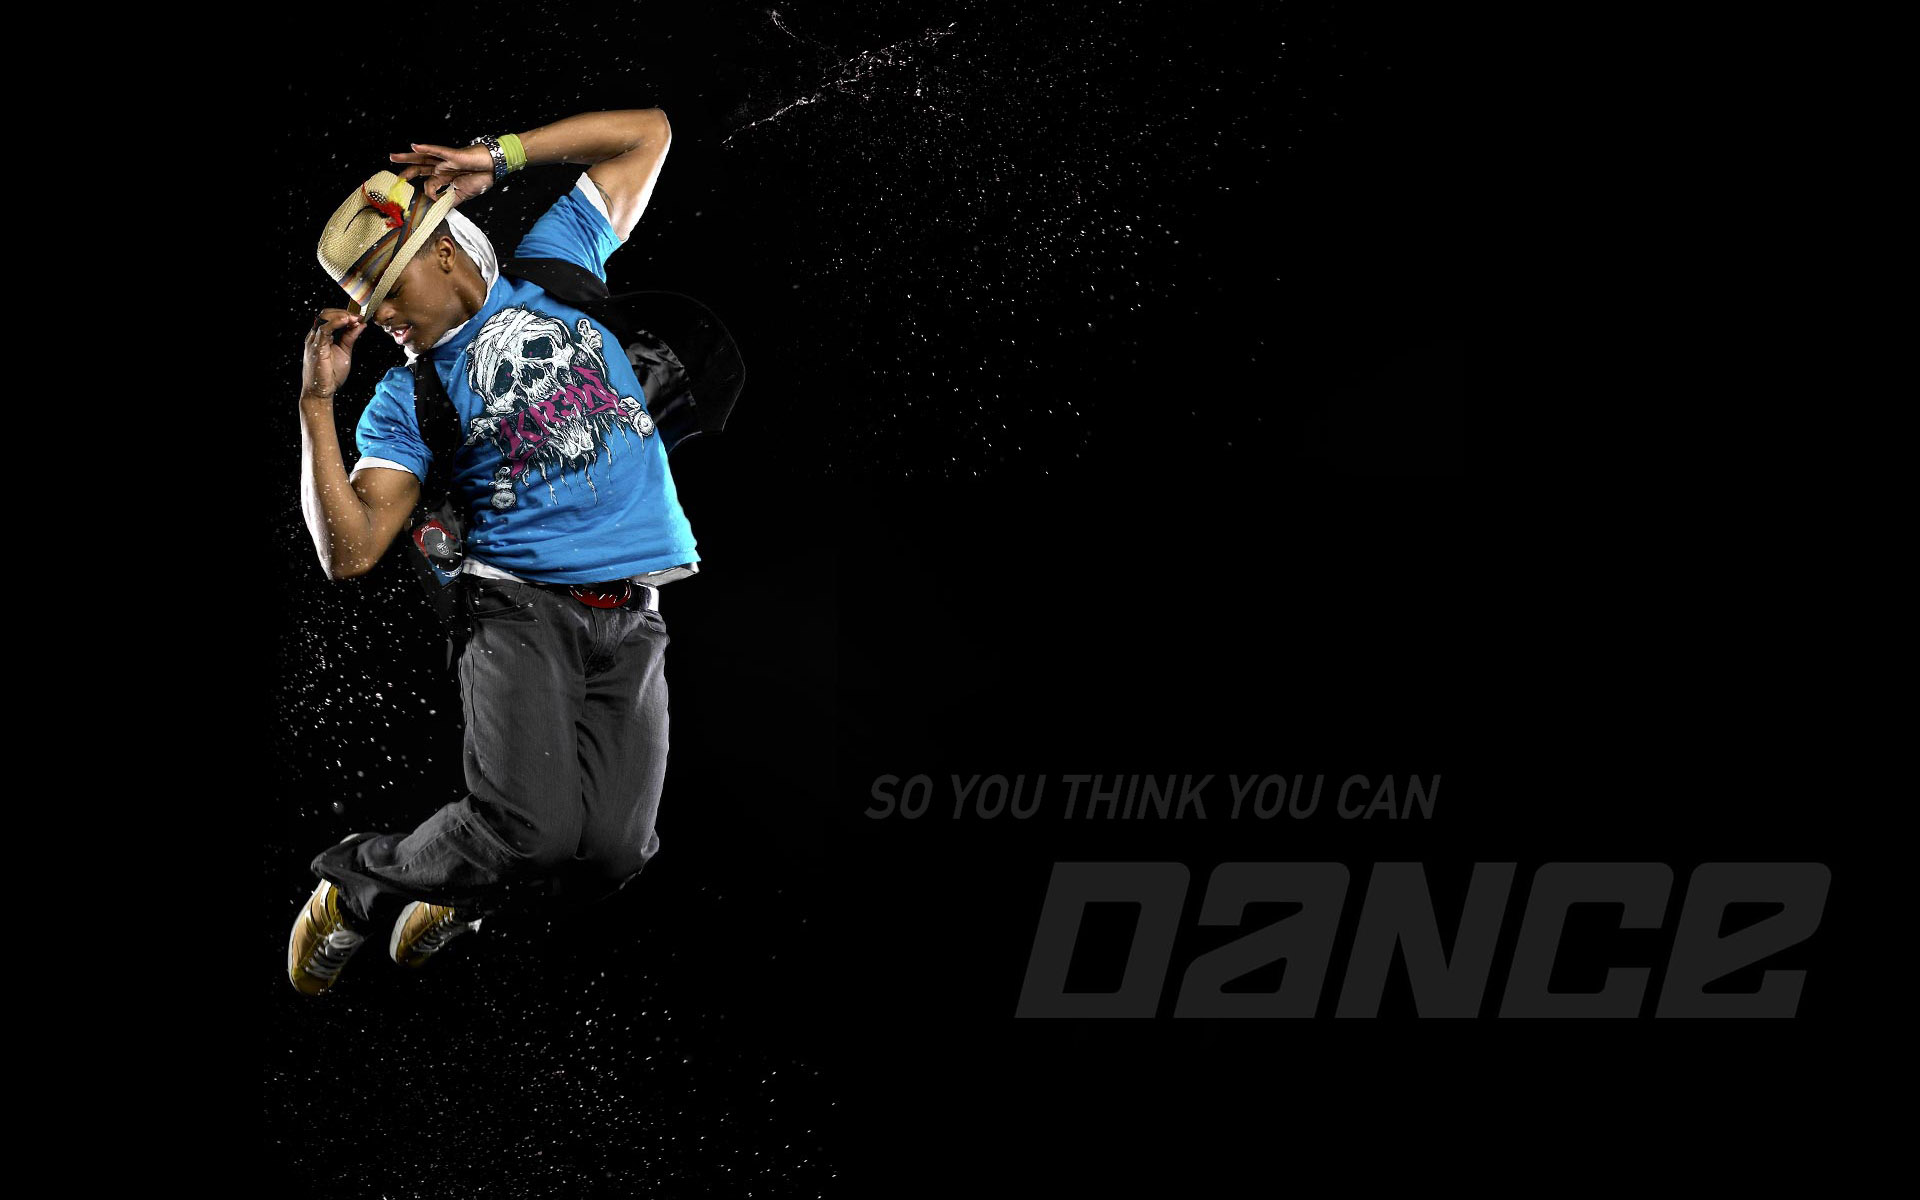 So You Think You Can Dance Tv Man Male Dancing Dancer Dance Wallpaper 1920x1200